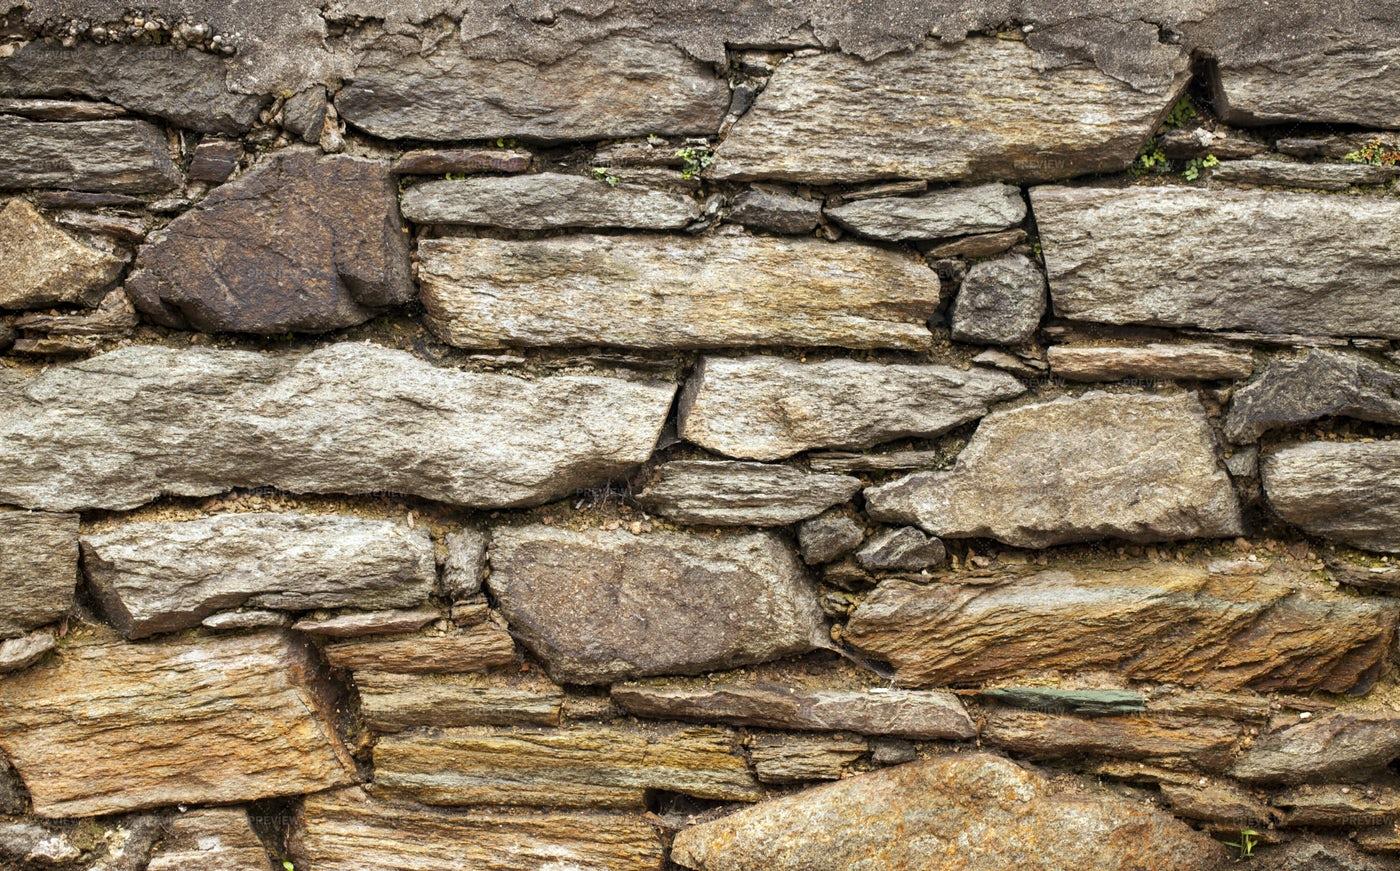 Grunge Stone Brick Wall: Stock Photos